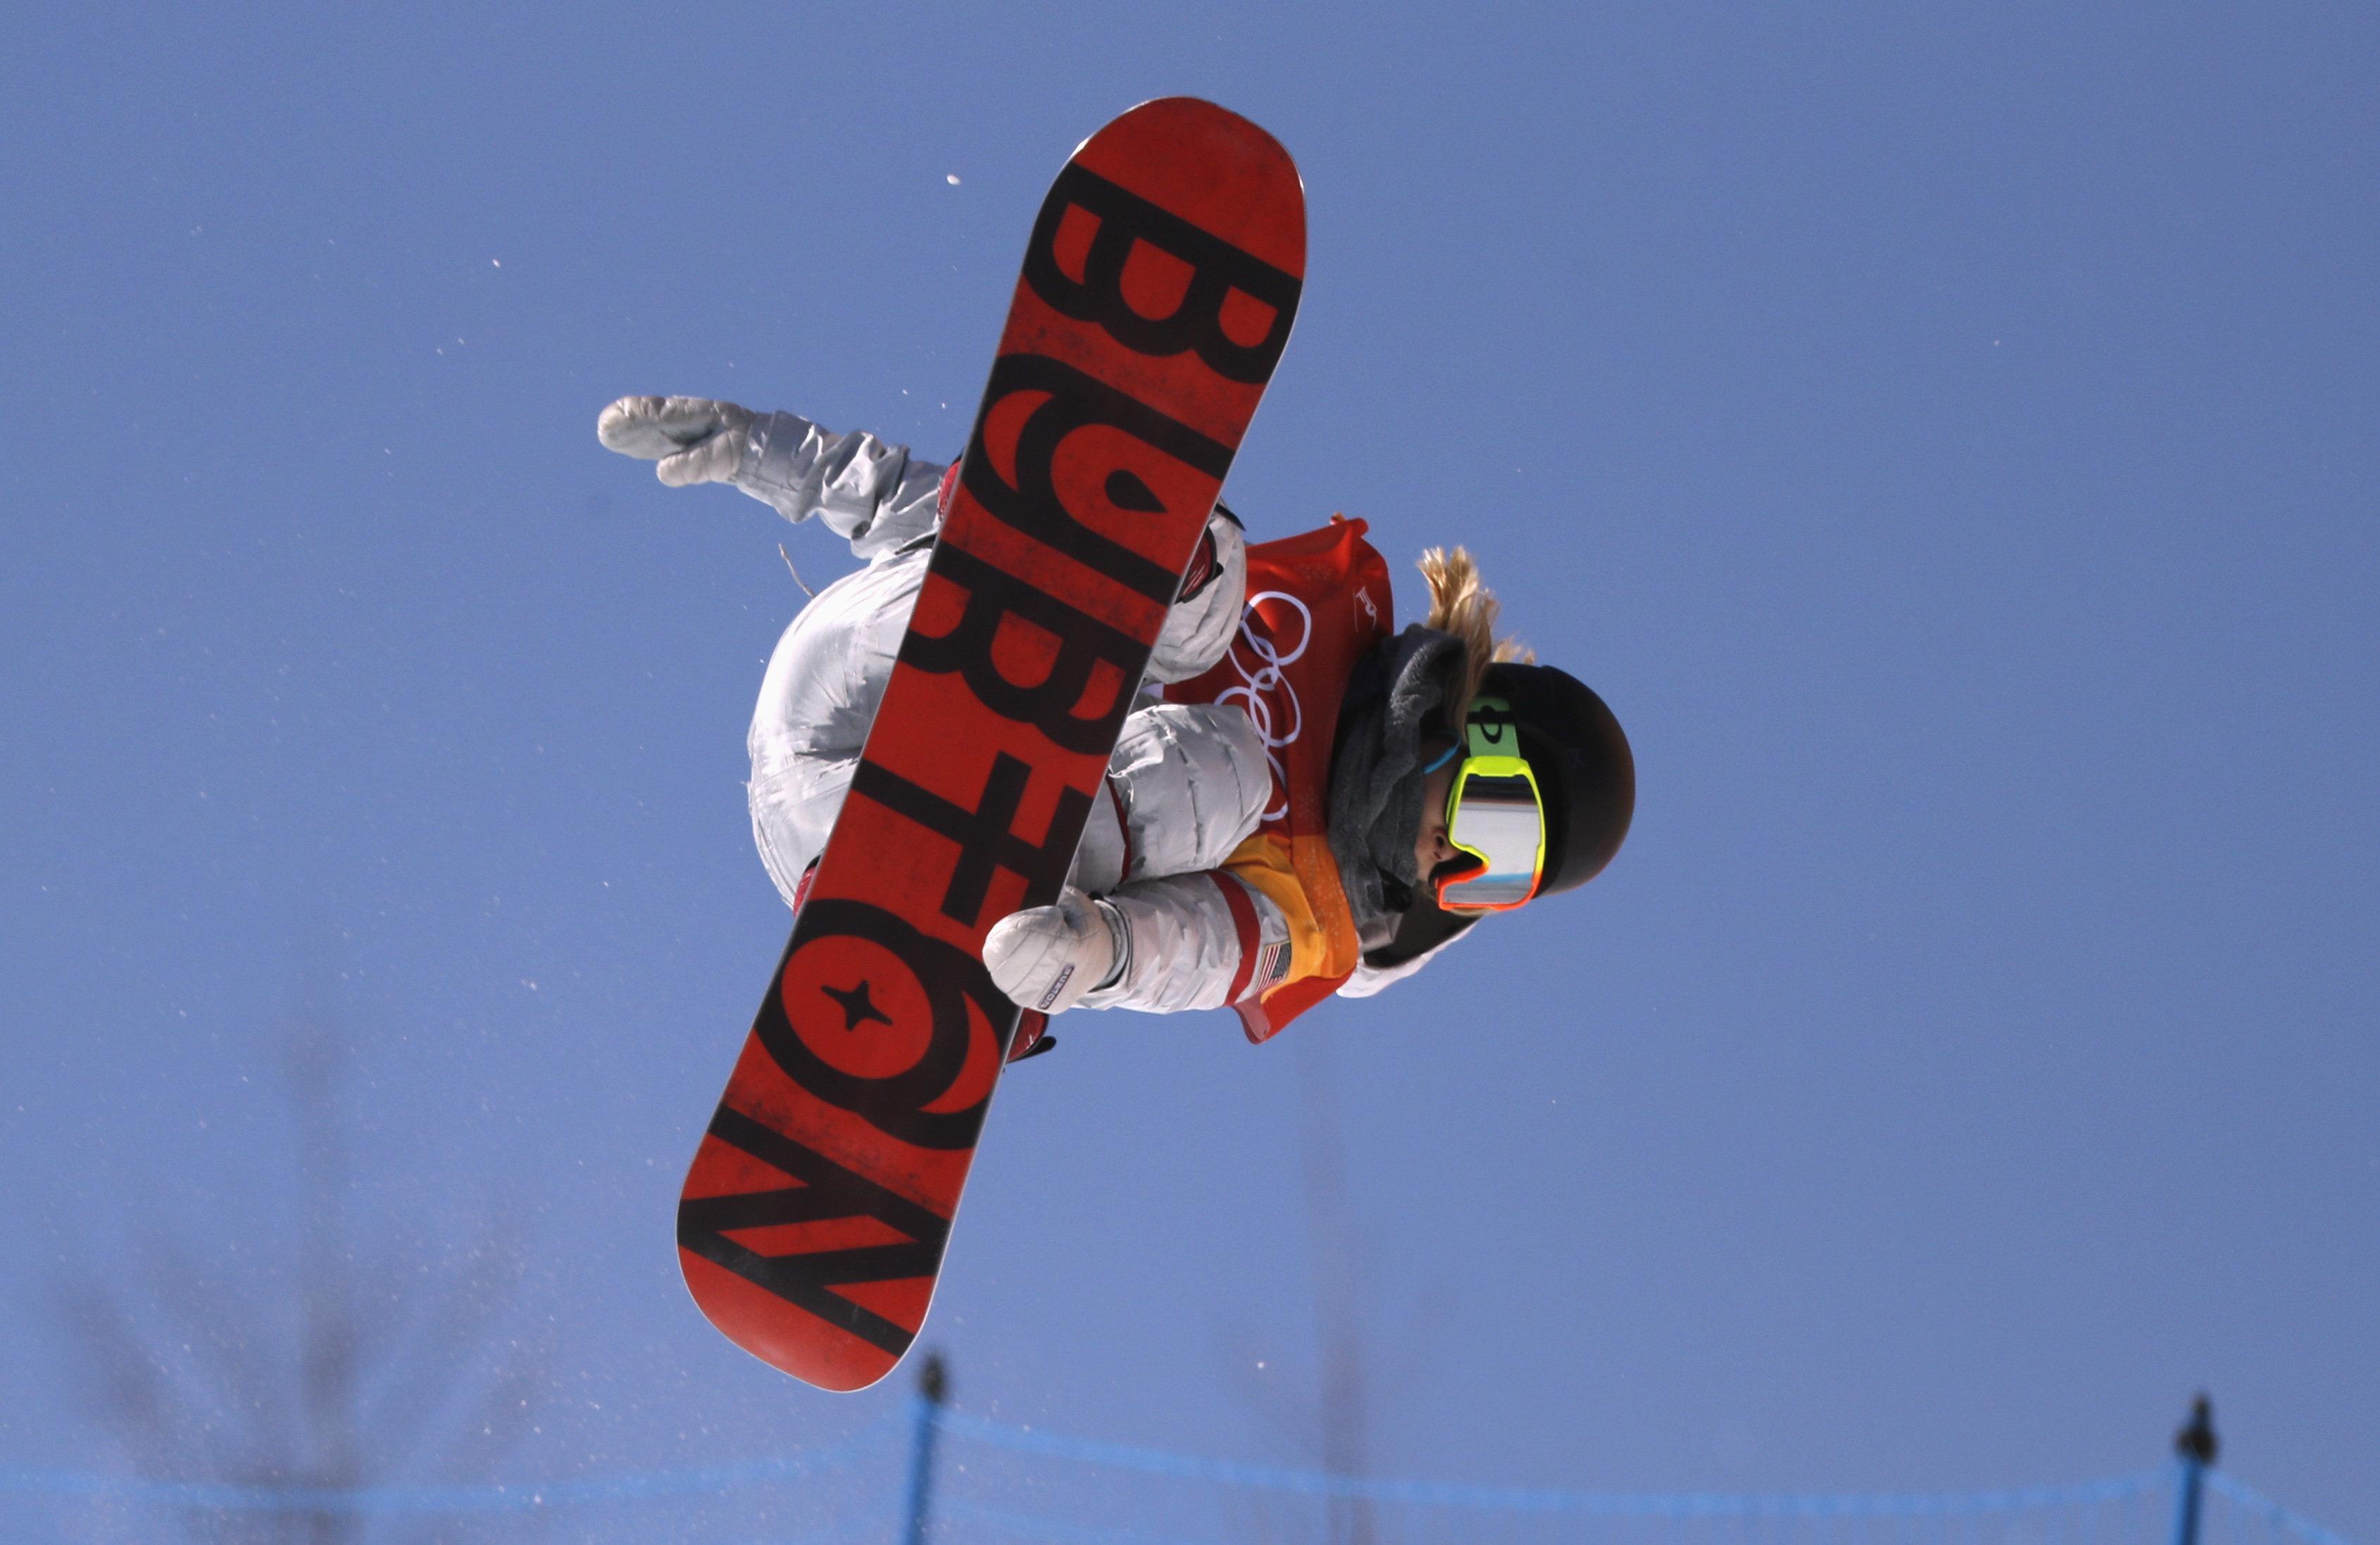 Snowboarding - Pyeongchang 2018 Winter Olympics - Women's Halfpipe Finals - Phoenix Snow Park - Pyeongchang, South Korea - February 13, 2018  - Chloe Kim of the U.S. competes. REUTERS/Jorge Silva